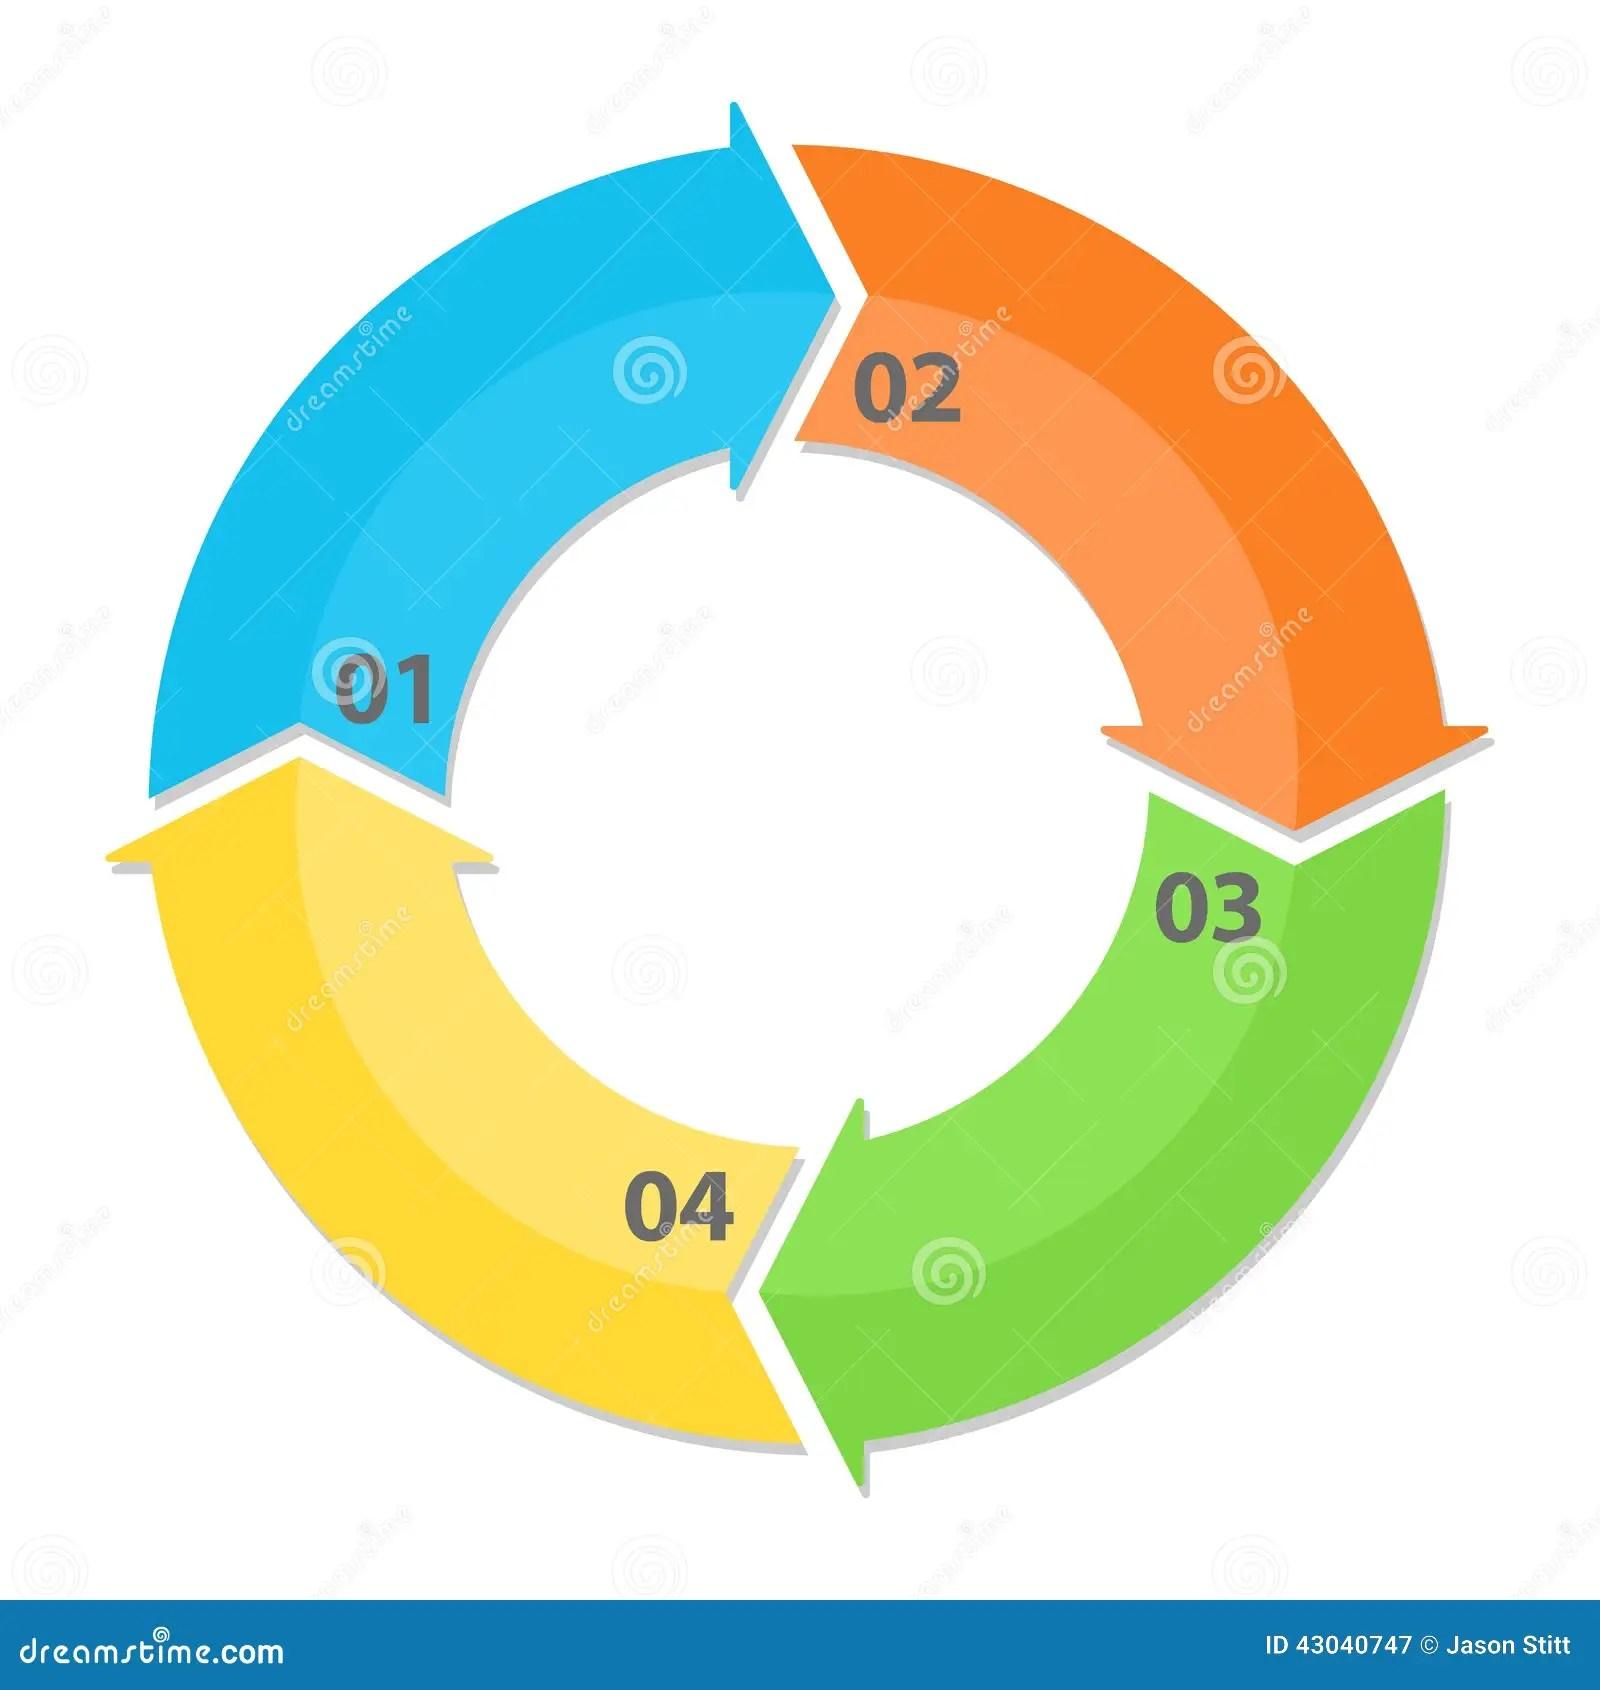 free circular arrow diagram template 2017 subaru wrx stereo wiring circle arrows stock vector image 43040747